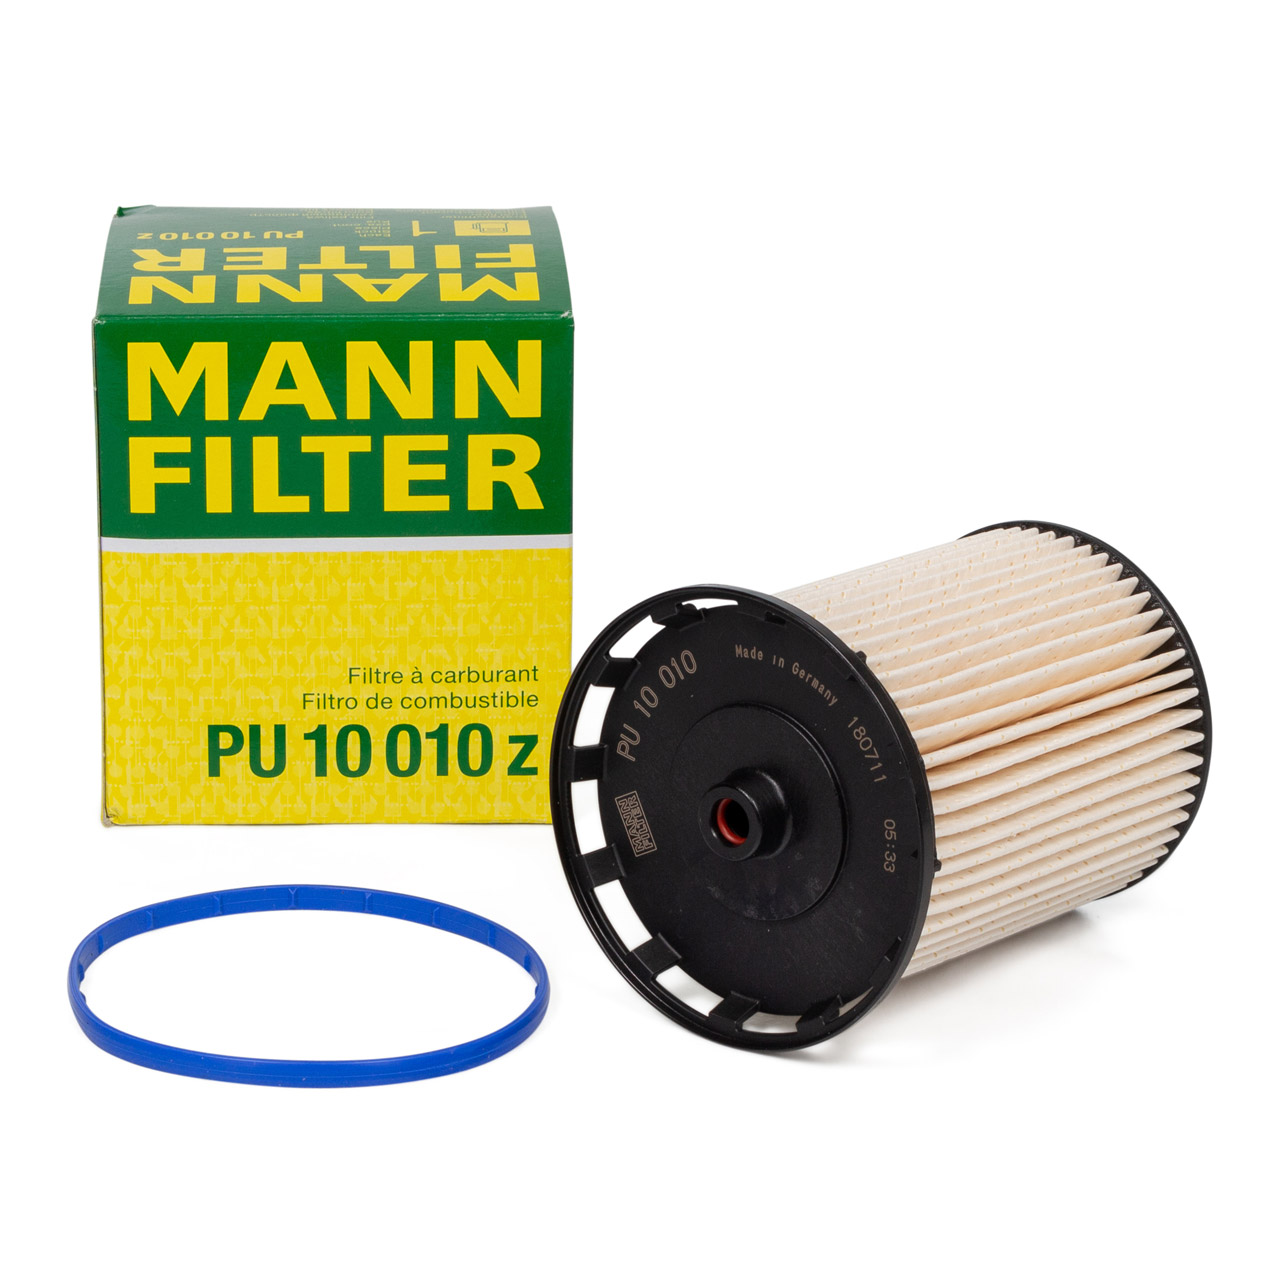 MANN PU10010z Kraftstofffilter Dieselfilter AUDI Q7 3.0 TDI VW TOUAREG 3.0 TDI